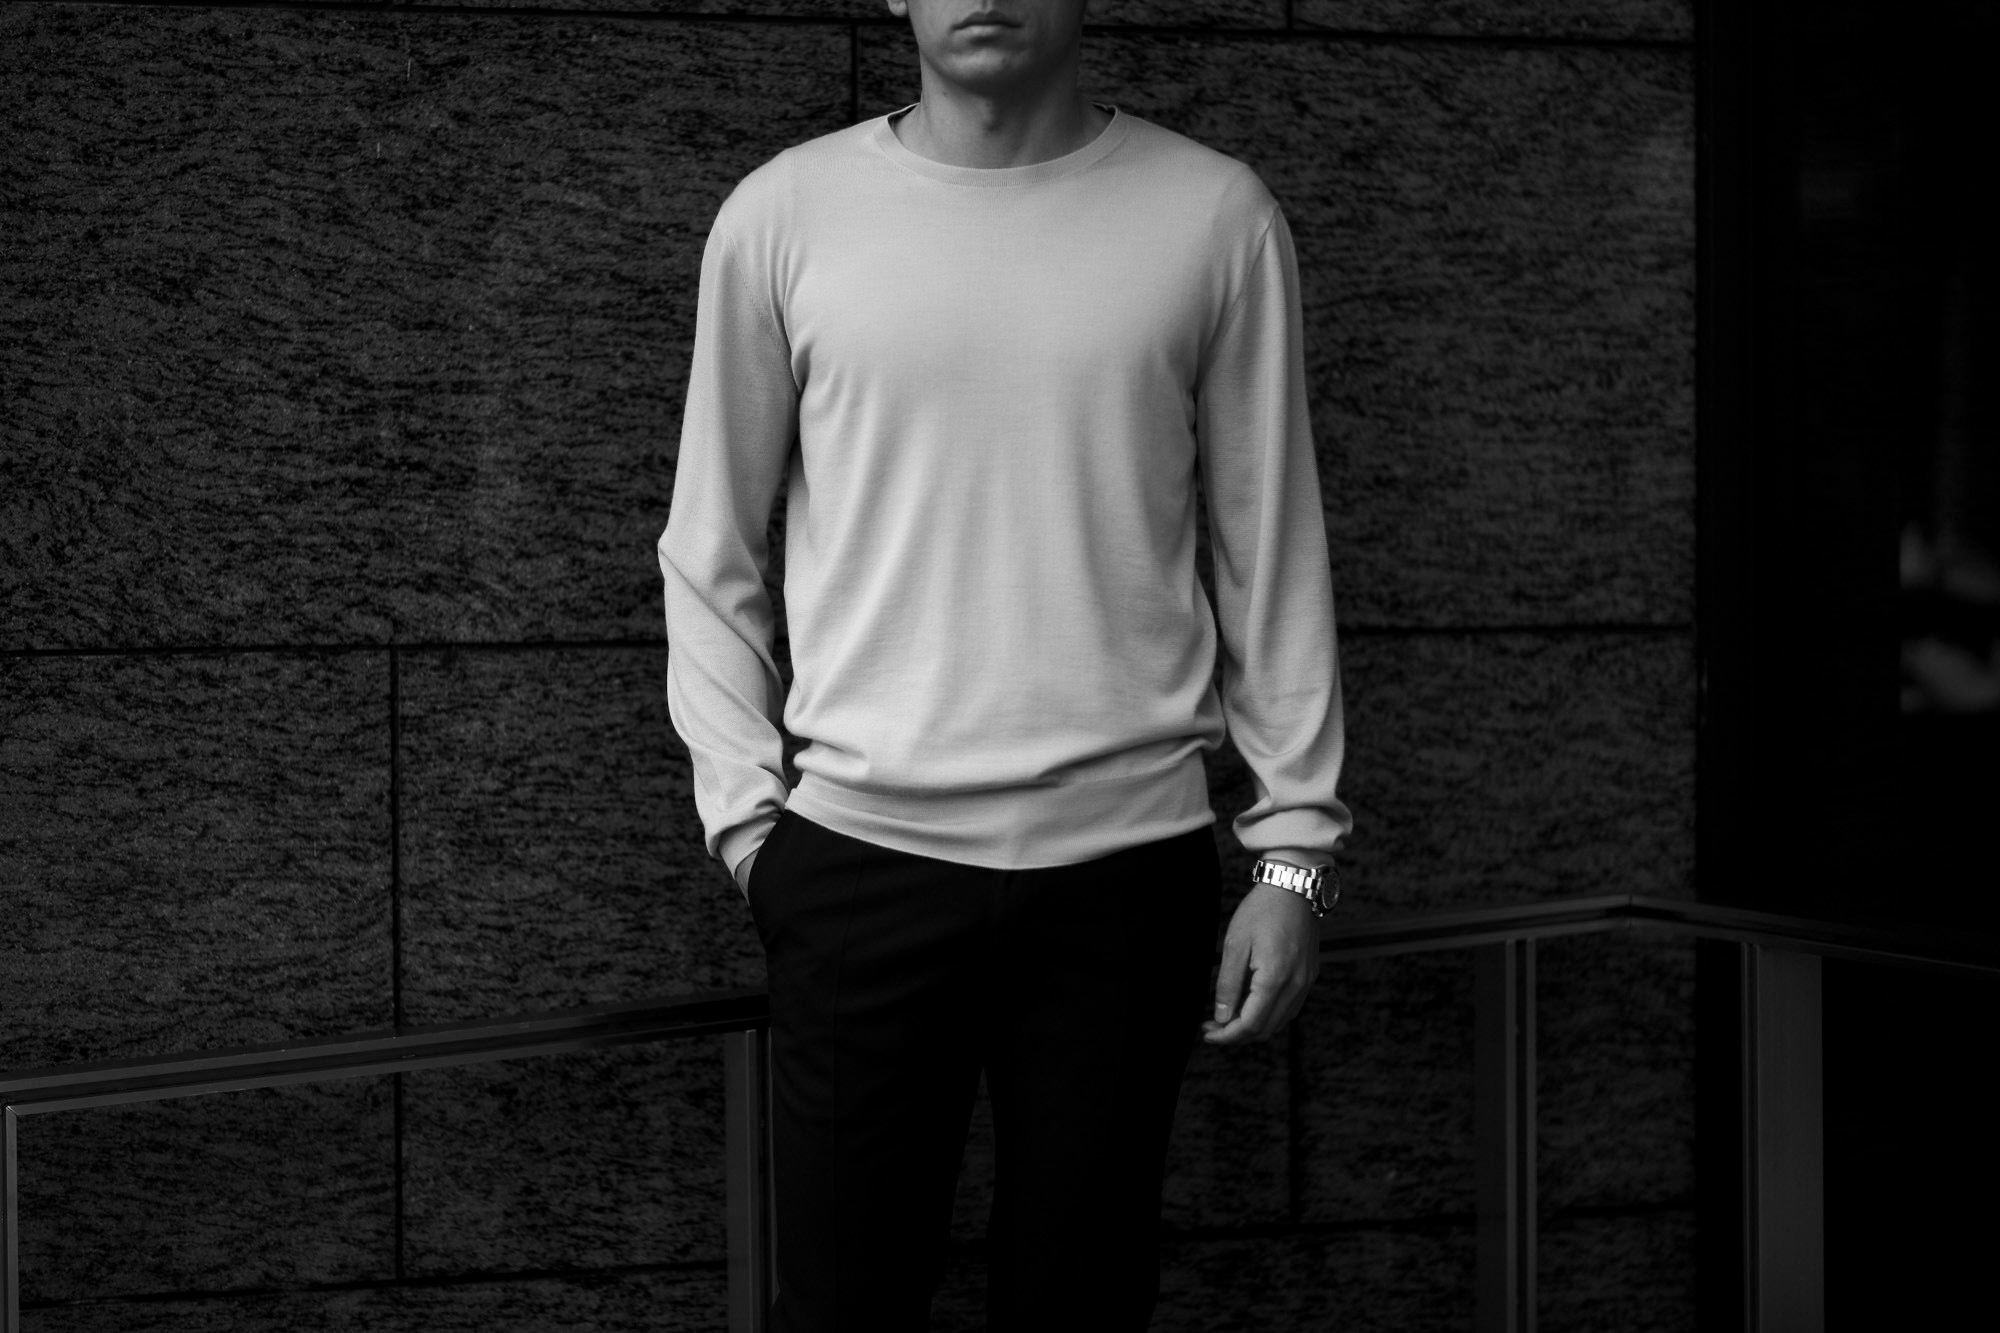 MANRICO CASHMERE (マンリコ カシミア) Silk Cashmere Wool Crew Neck Sweater (シルクカシミアウール クルーネック セーター) ハイゲージ シルクカシミアウール ニット セーター BLACK (ブラック) made in italy (イタリア製) 2020 秋冬 【ご予約受付中】愛知 名古屋 altoediritto アルトエデリット manricocashmere マンリコカシミア